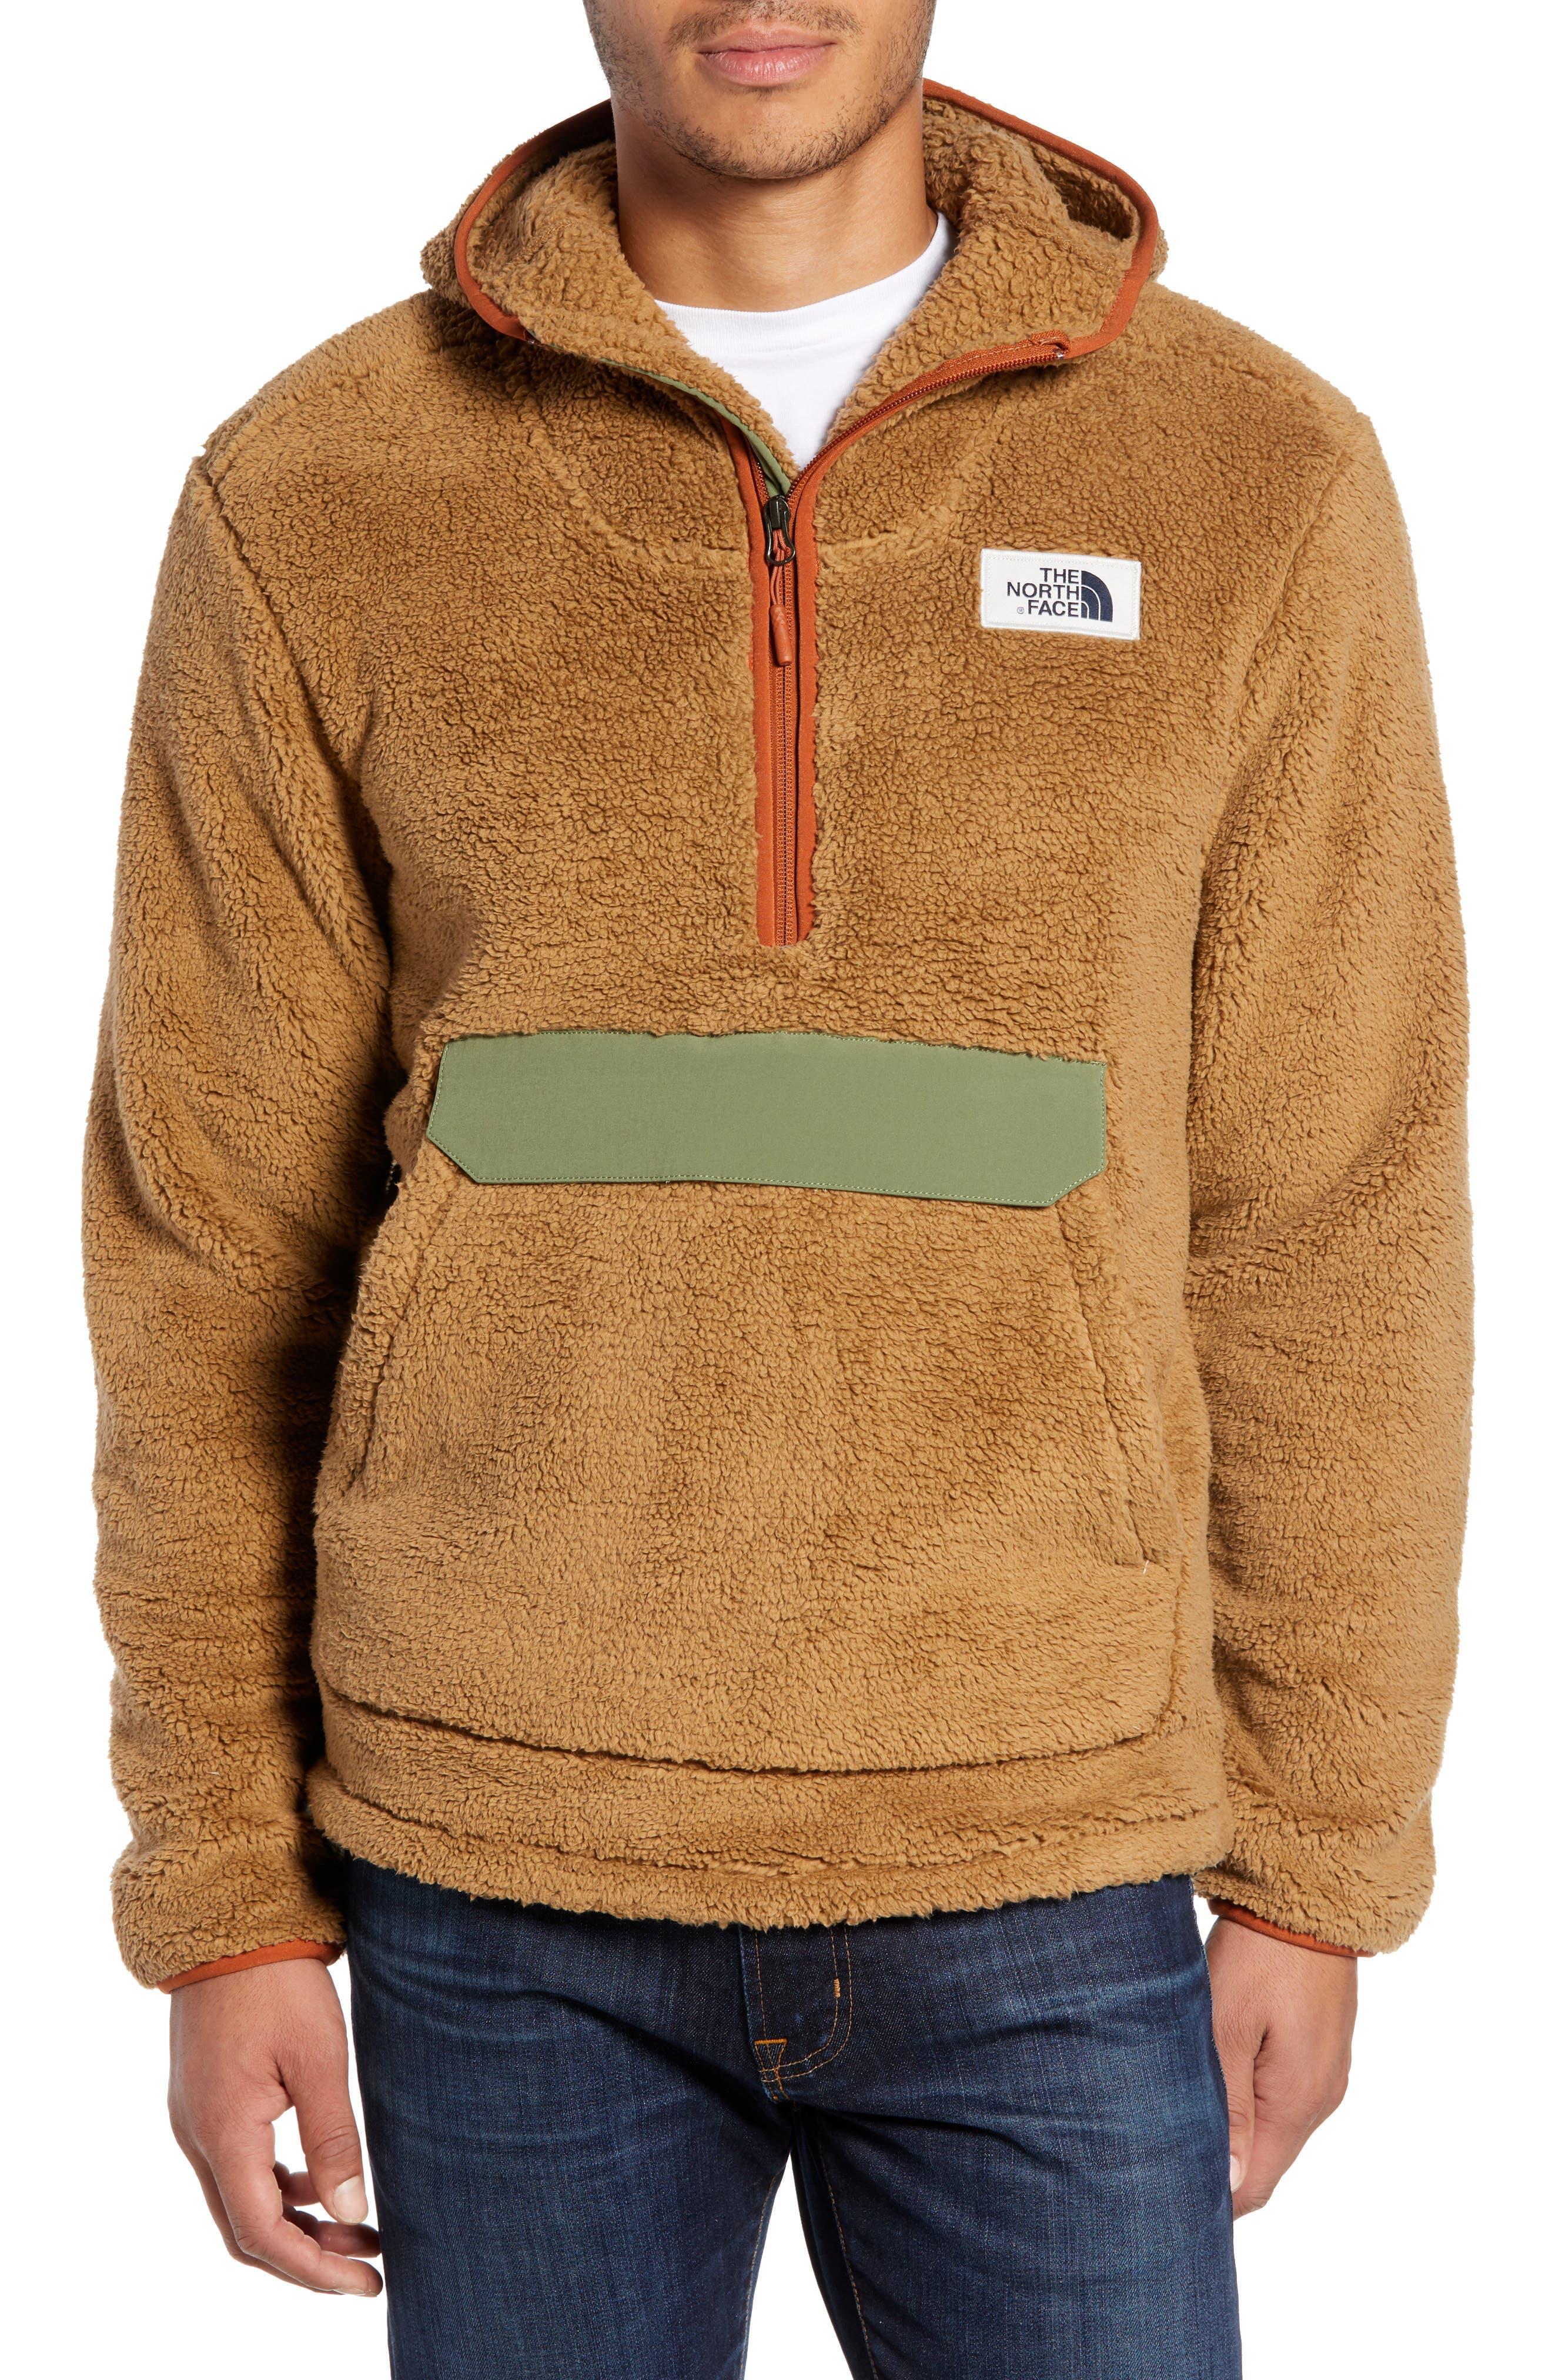 THE NORTH FACE Campshire Anorak Fleece Jacket, Main, color, CARGO KHAKI/ FOUR LEAF CLOVER